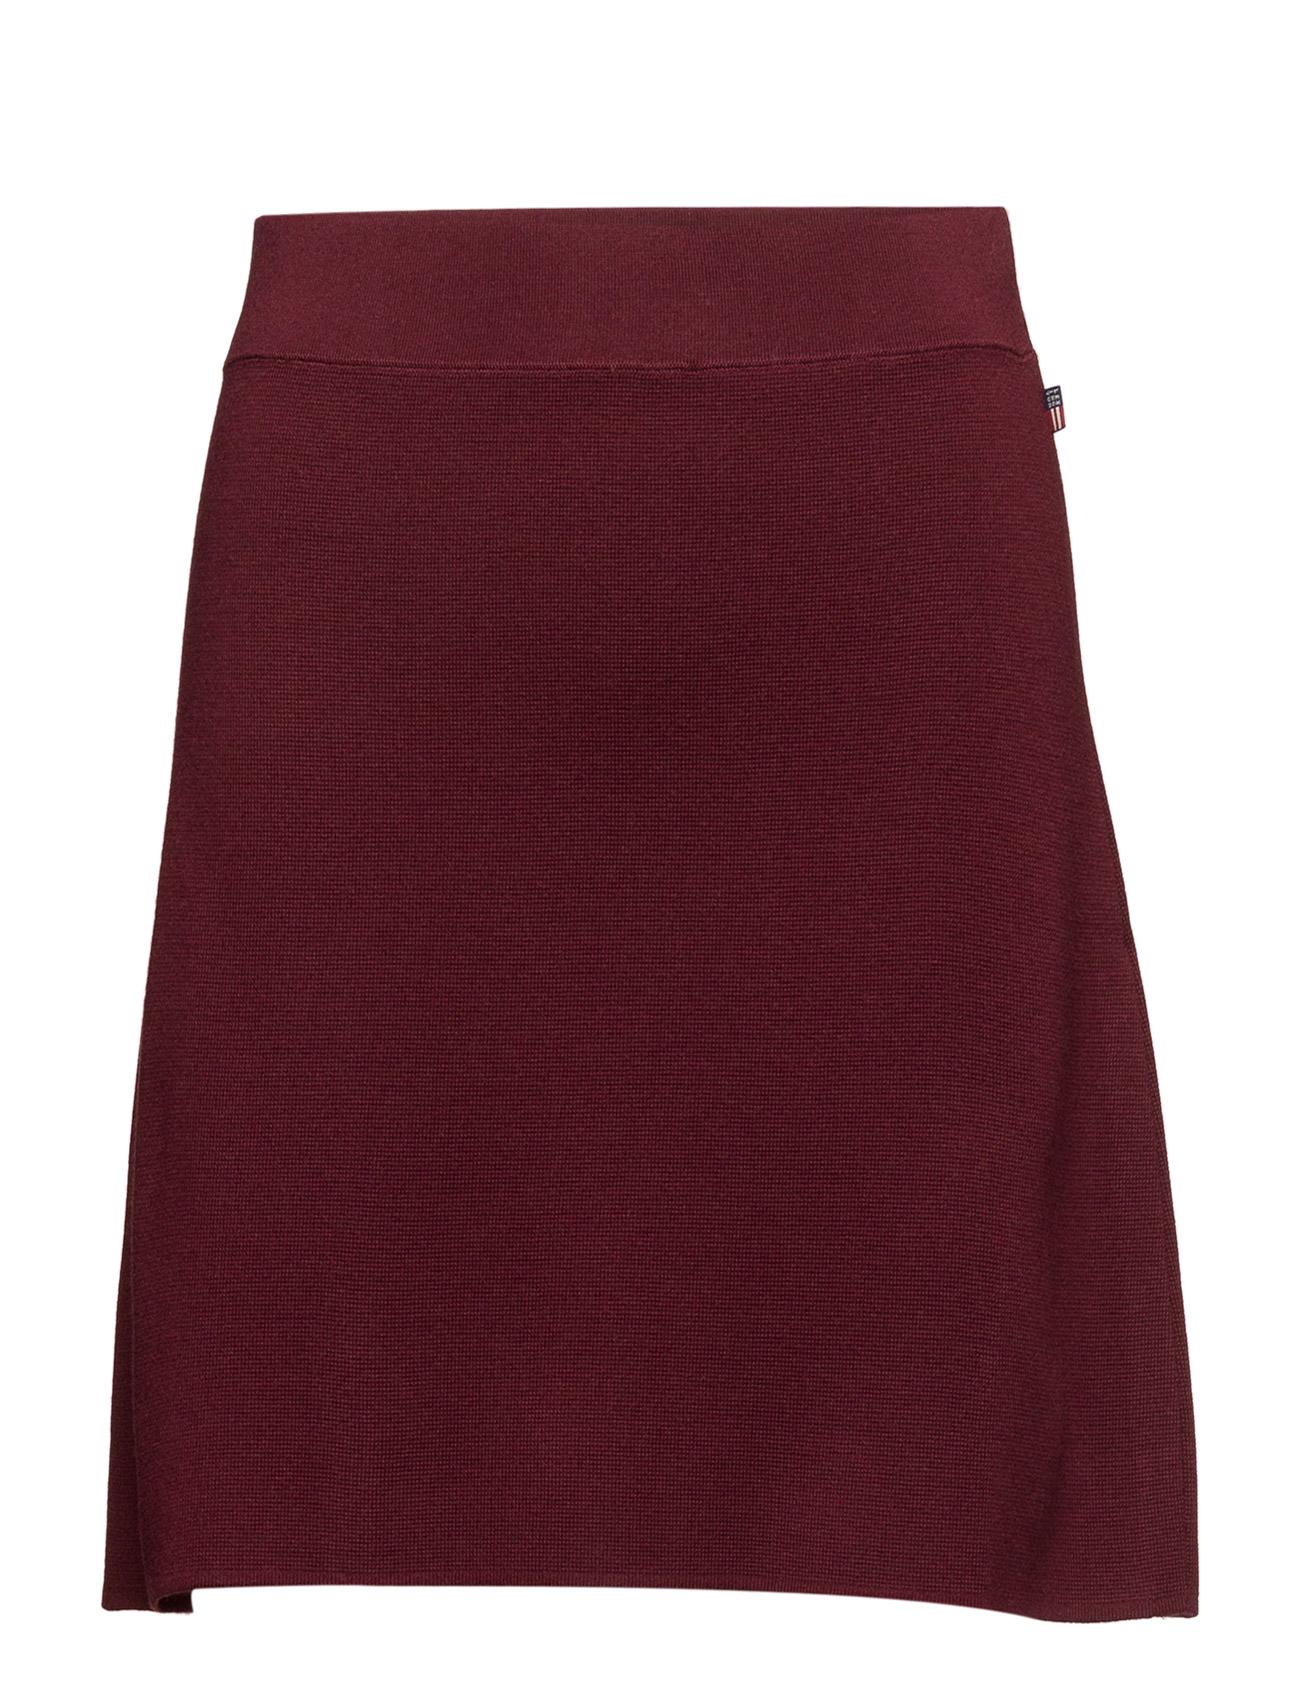 Chastity Knit Skirt Lexington Company Korte til Damer i Zinfandel Rød